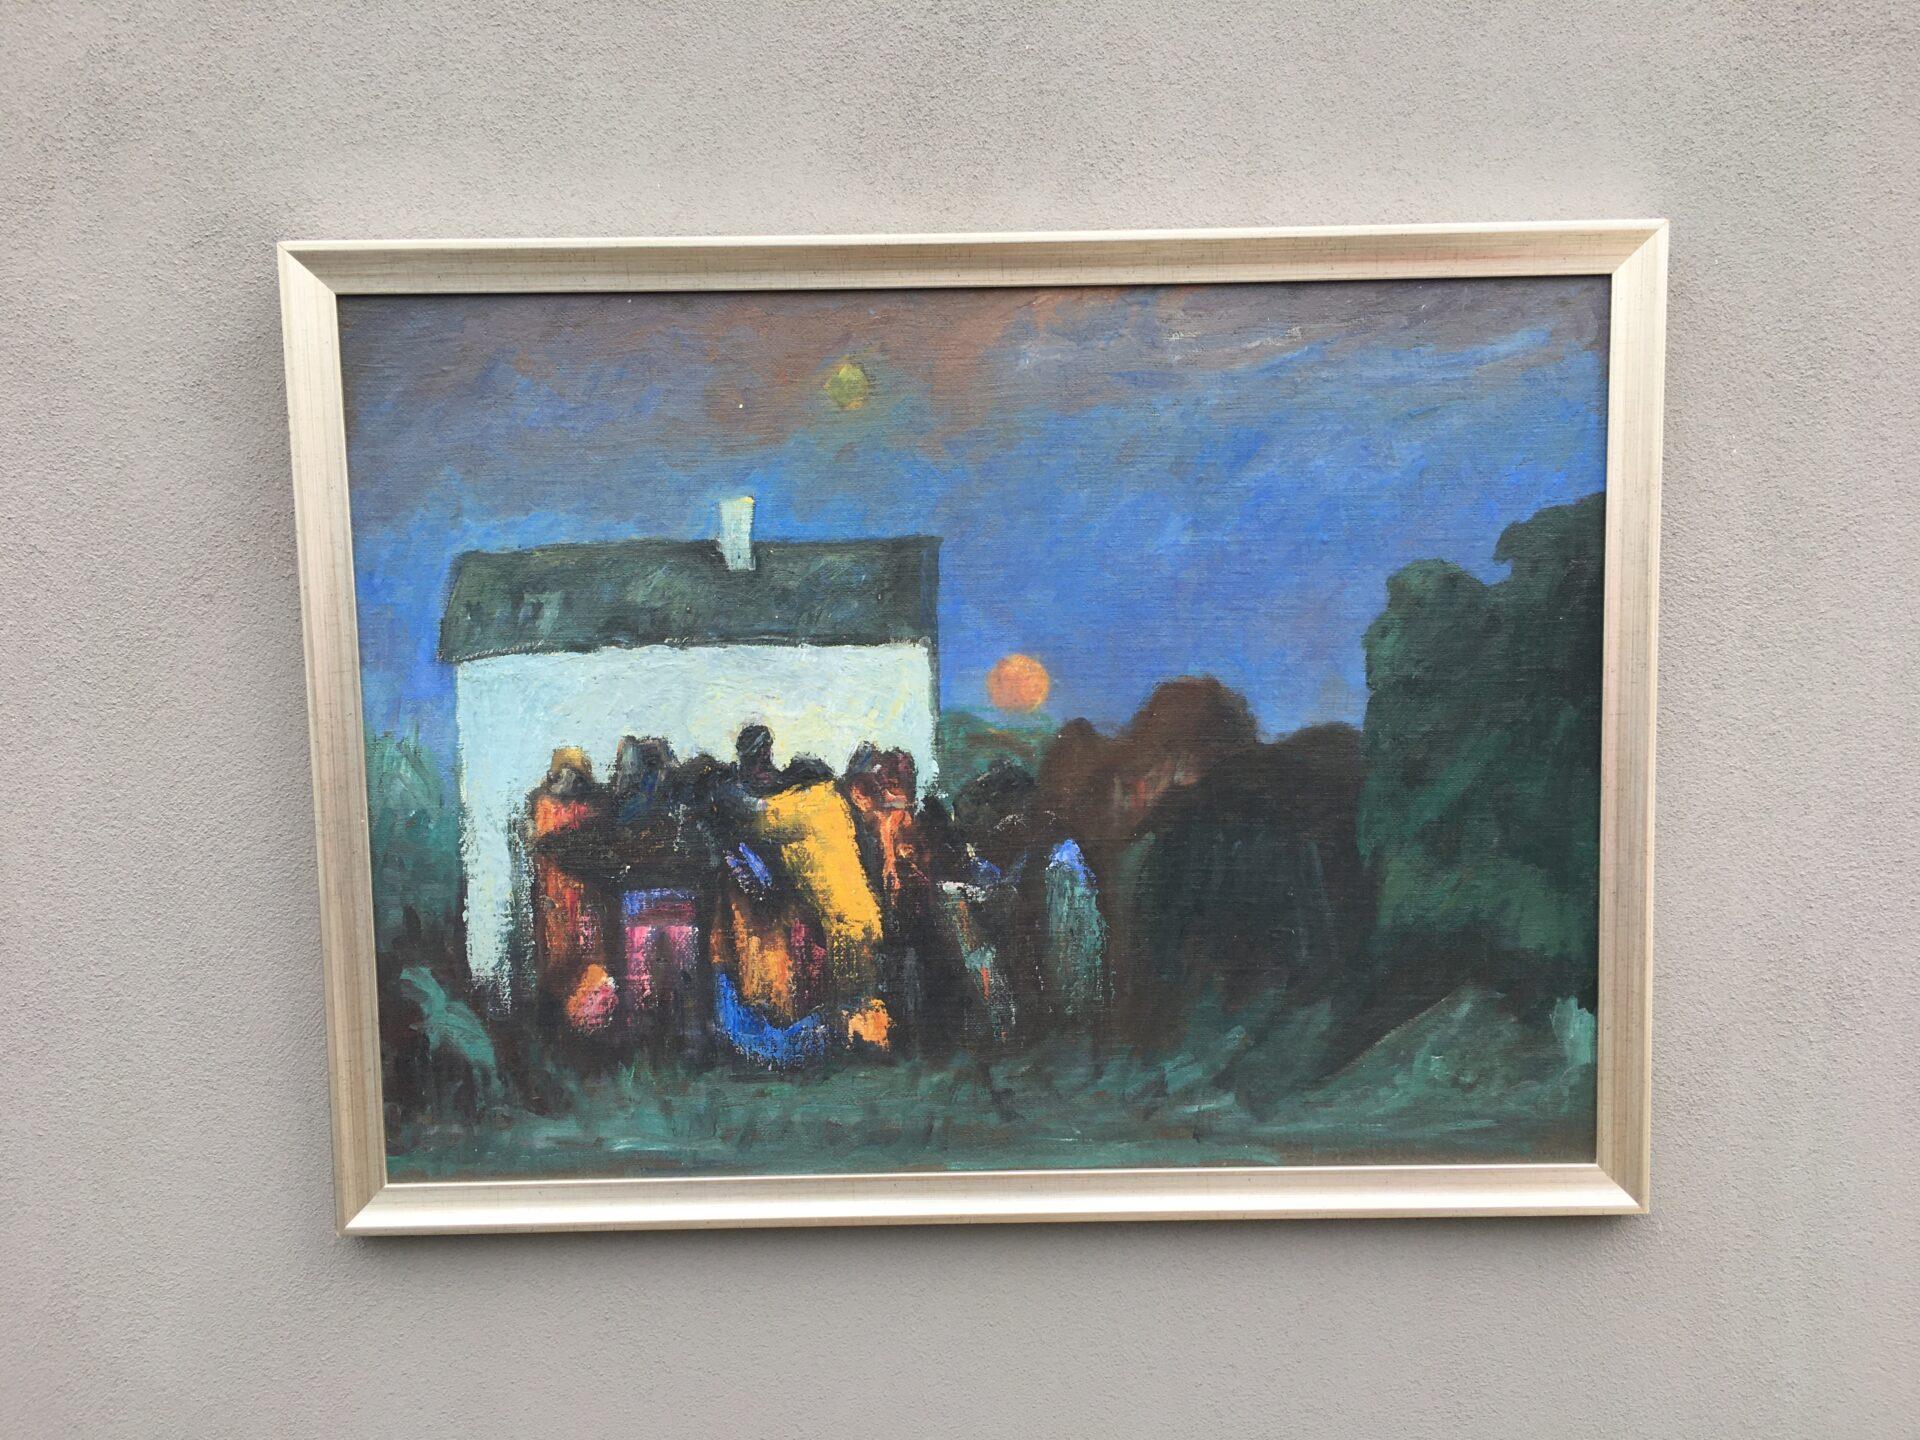 Regnar Jacobsen, Vejle, rammemål 96x72 cm, pris 500kr